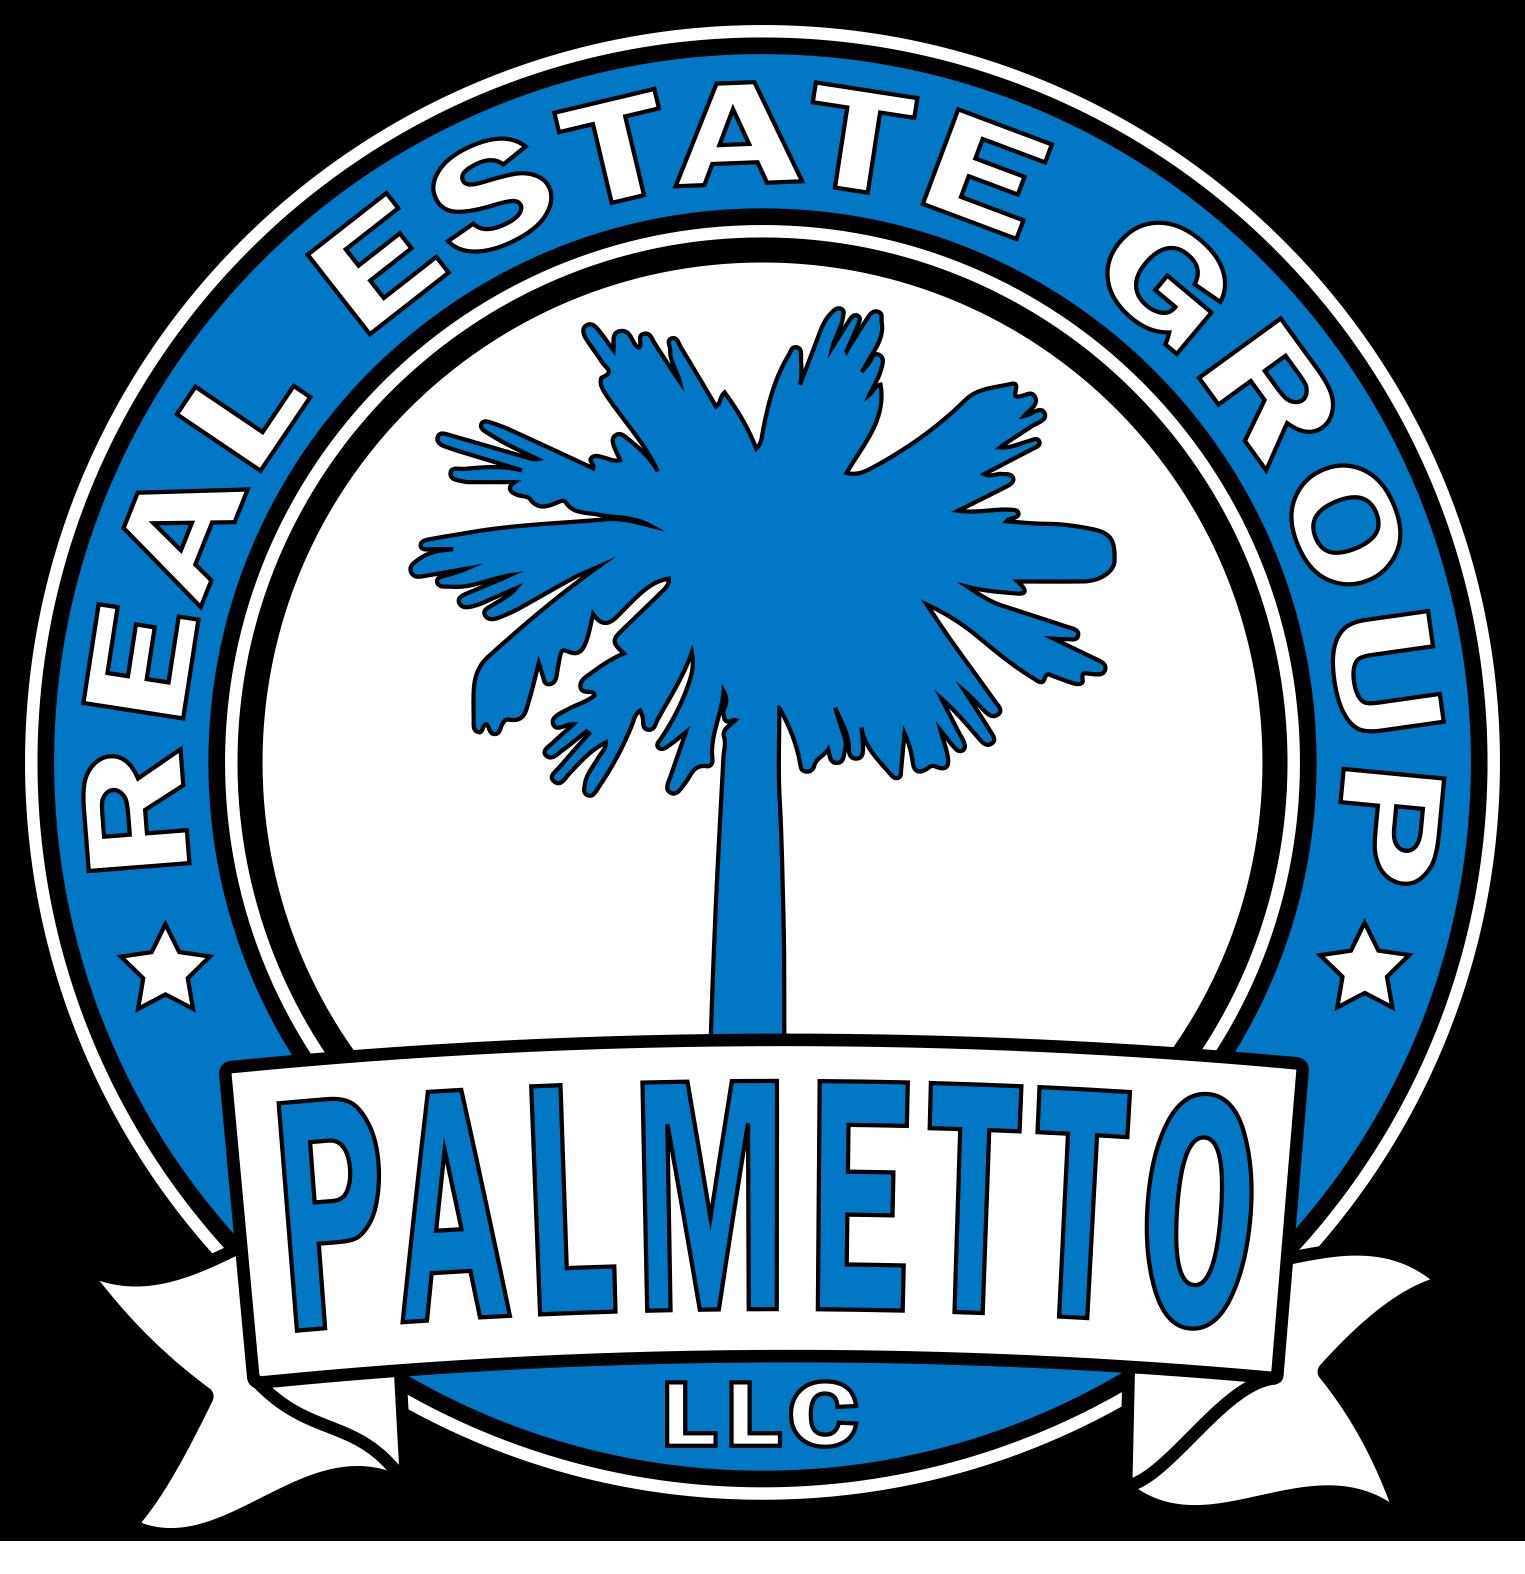 Palmetto Real Estate Group LLC